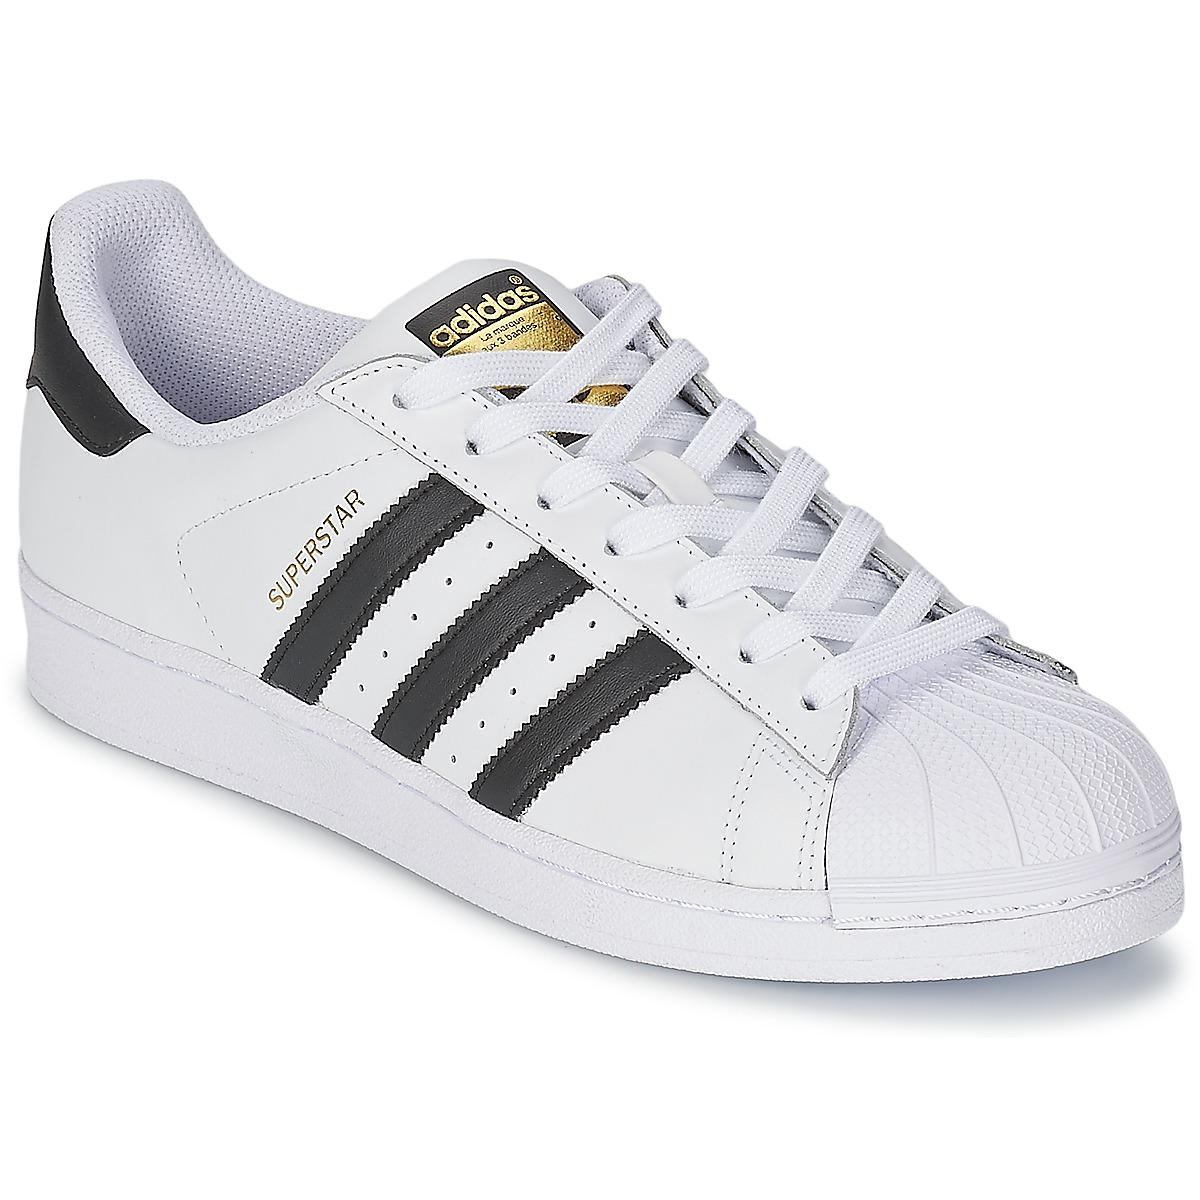 adidas Originals SUPERSTAR White / Black